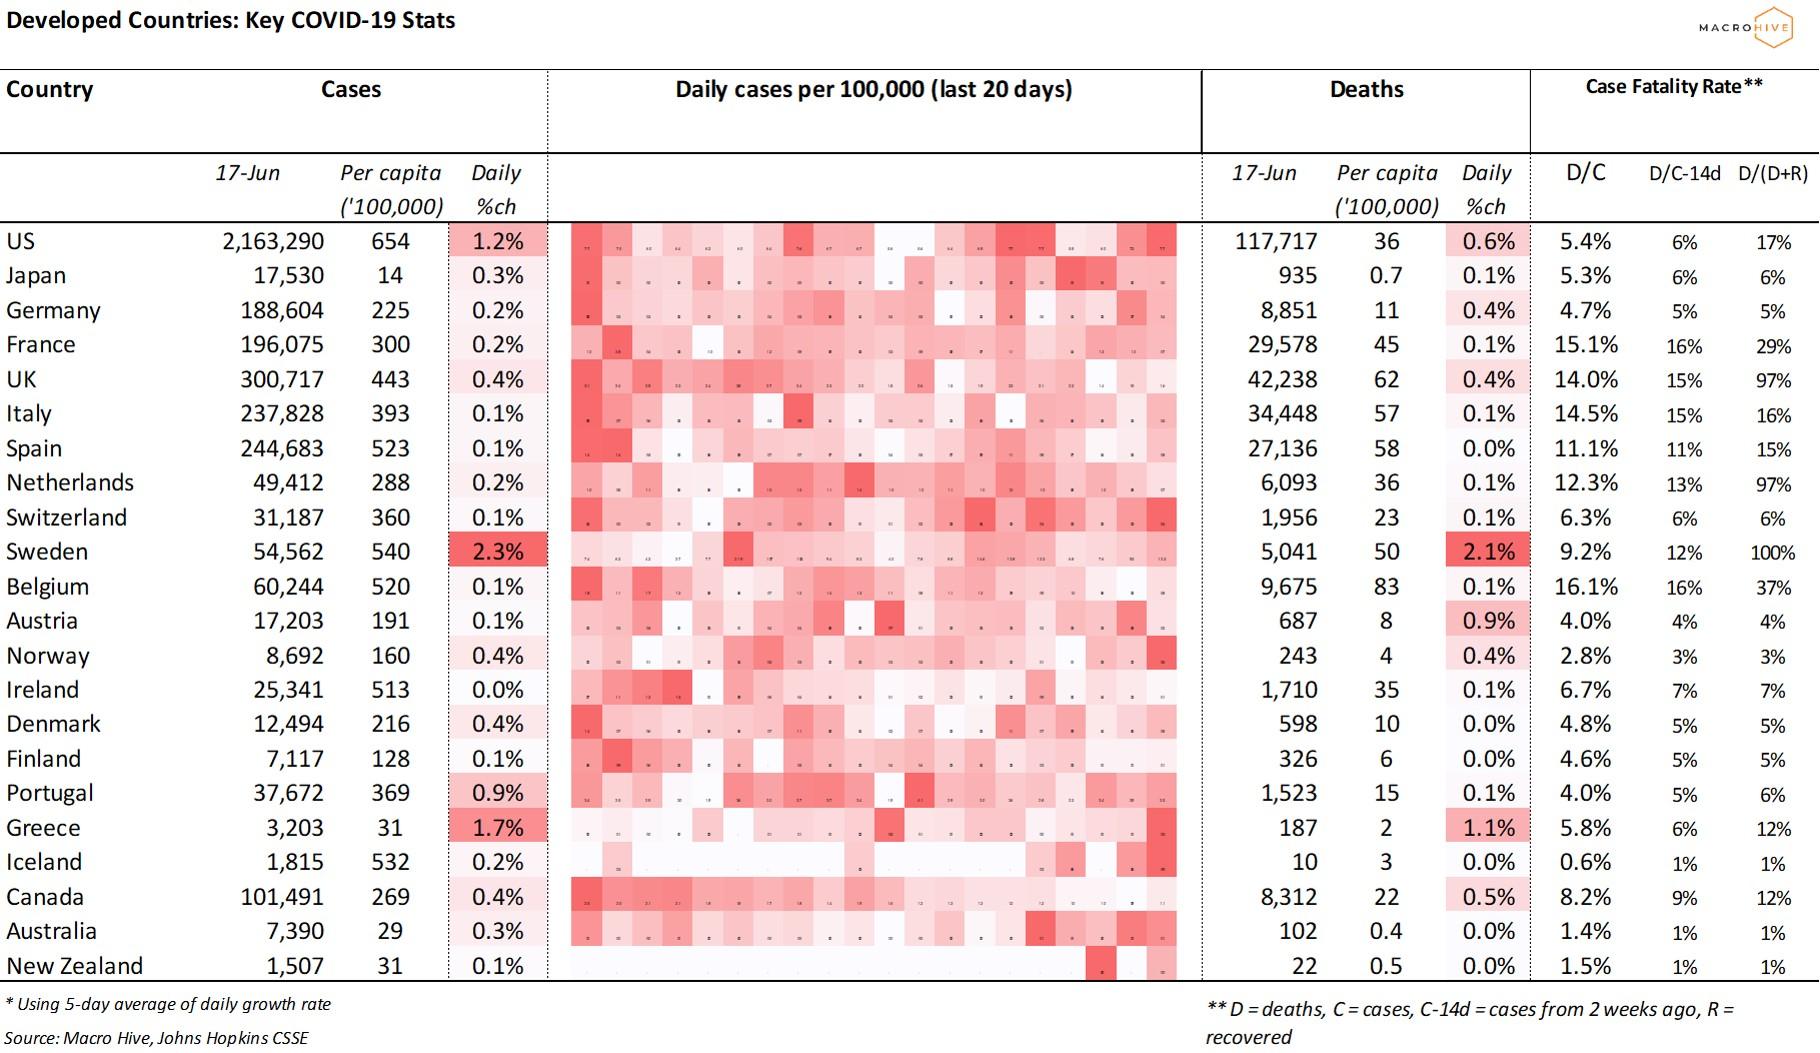 DM Key COVID Stats